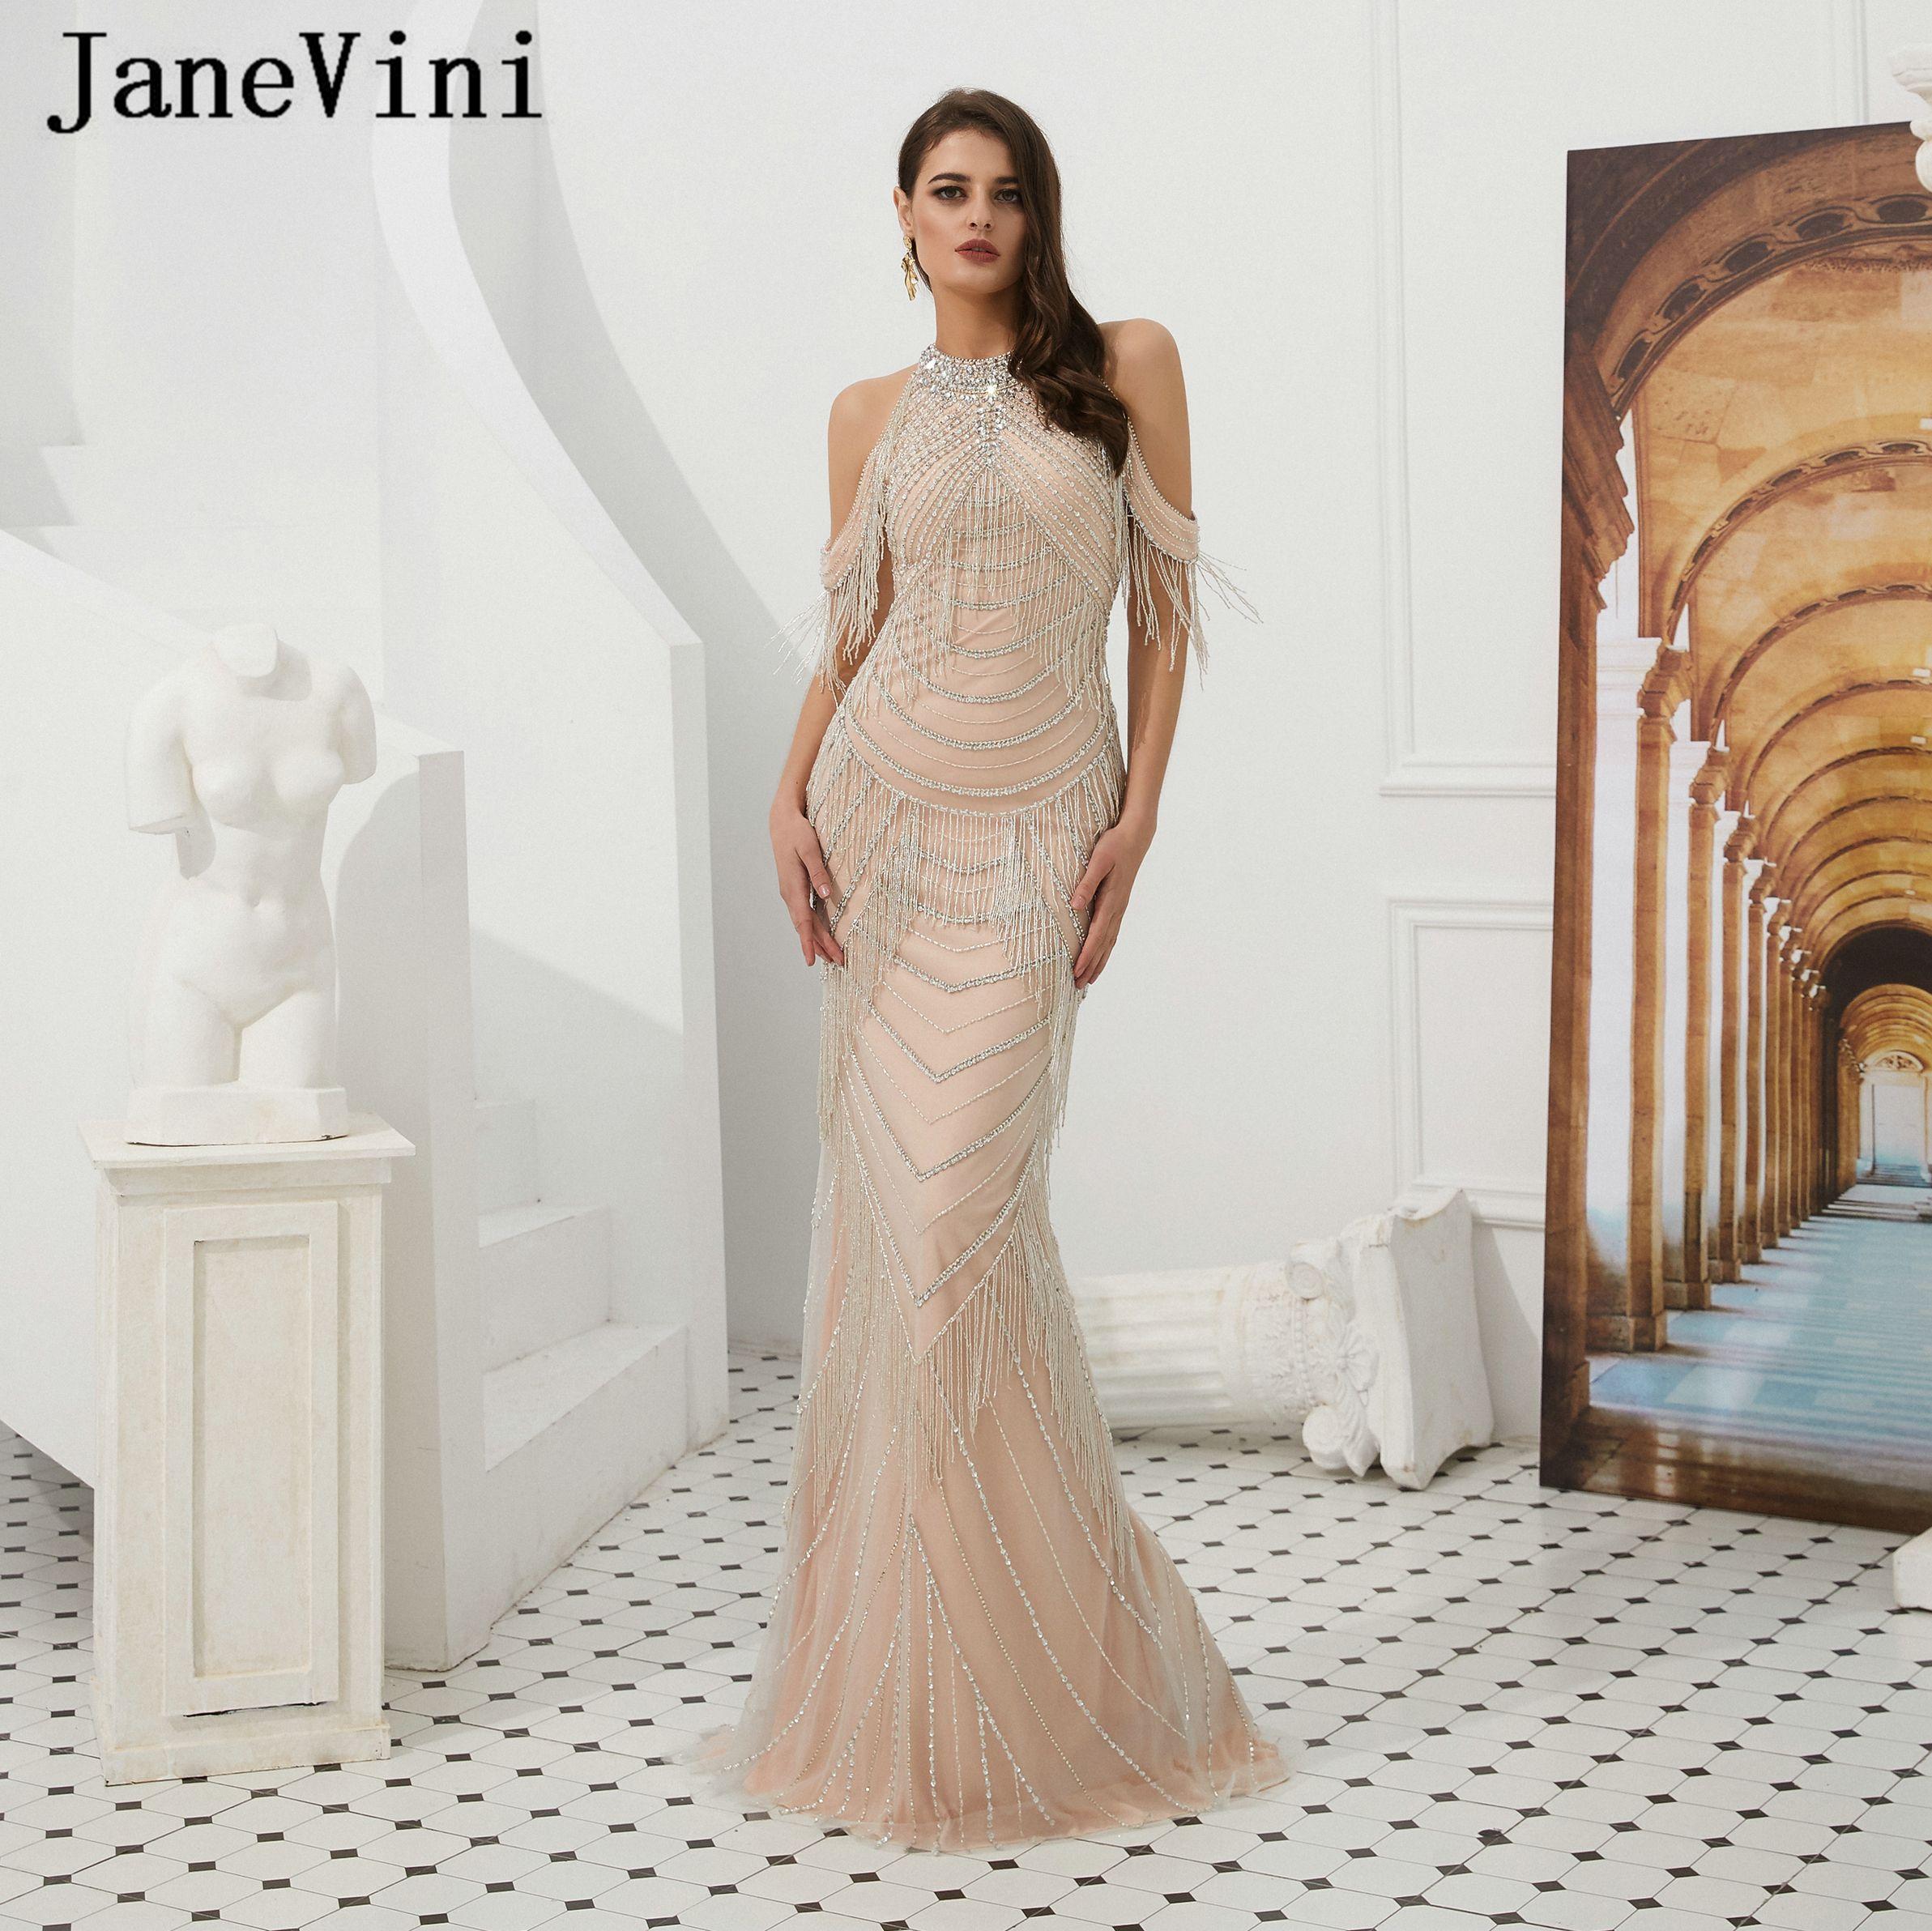 9b63560316 JaneVini 2019 Luxury Mermaid Long Evening Dresses High Neck Tassel Beading  Sleeveless Sheer Back Women Sexy Prom Party Gowns Vestido Largo